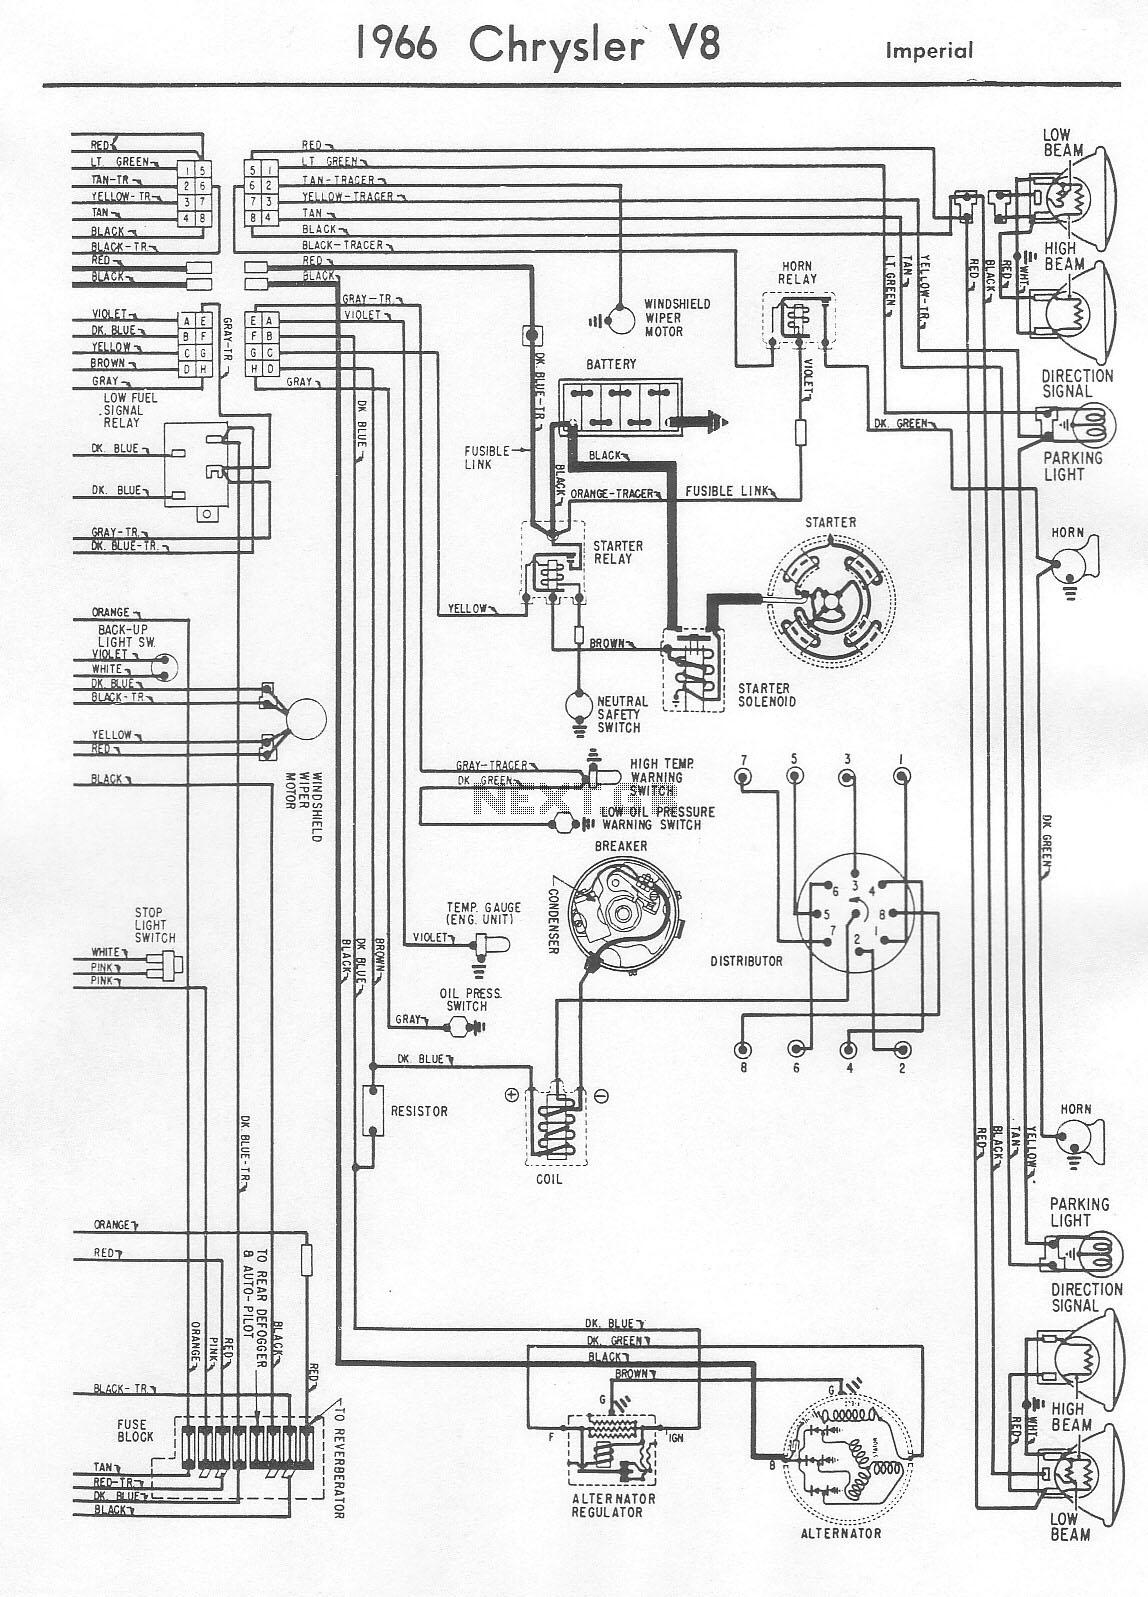 1986 Chrysler New Yorker Wiring Diagram